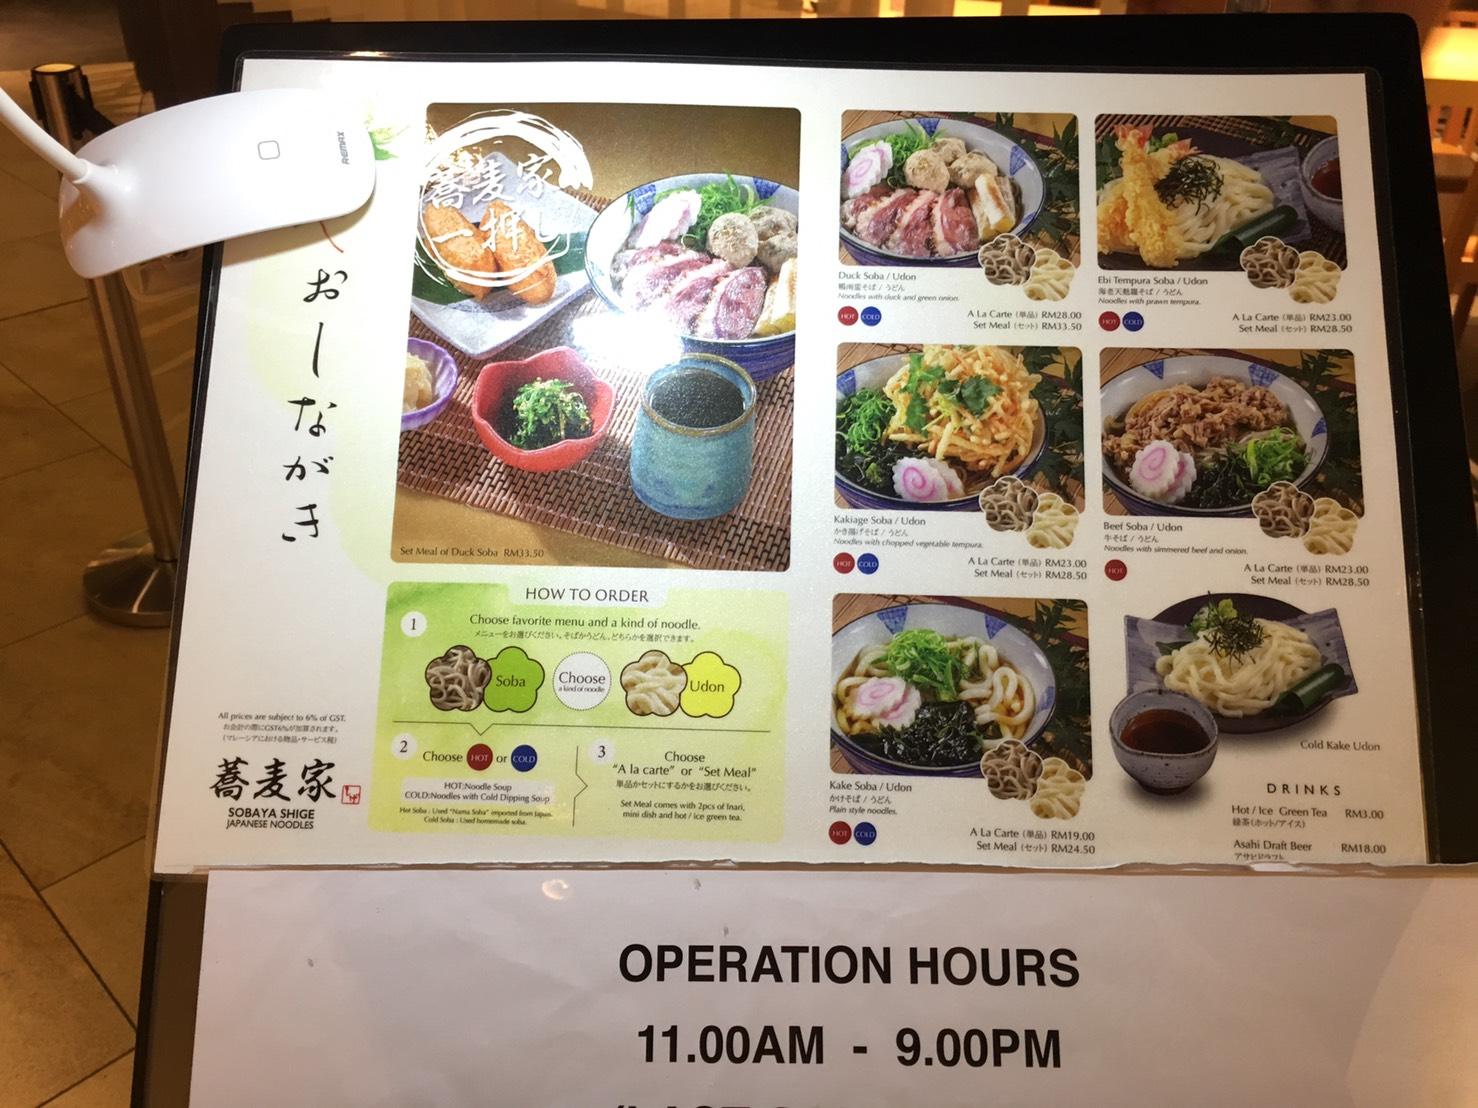 蕎麦家 Sobaya Shige menu